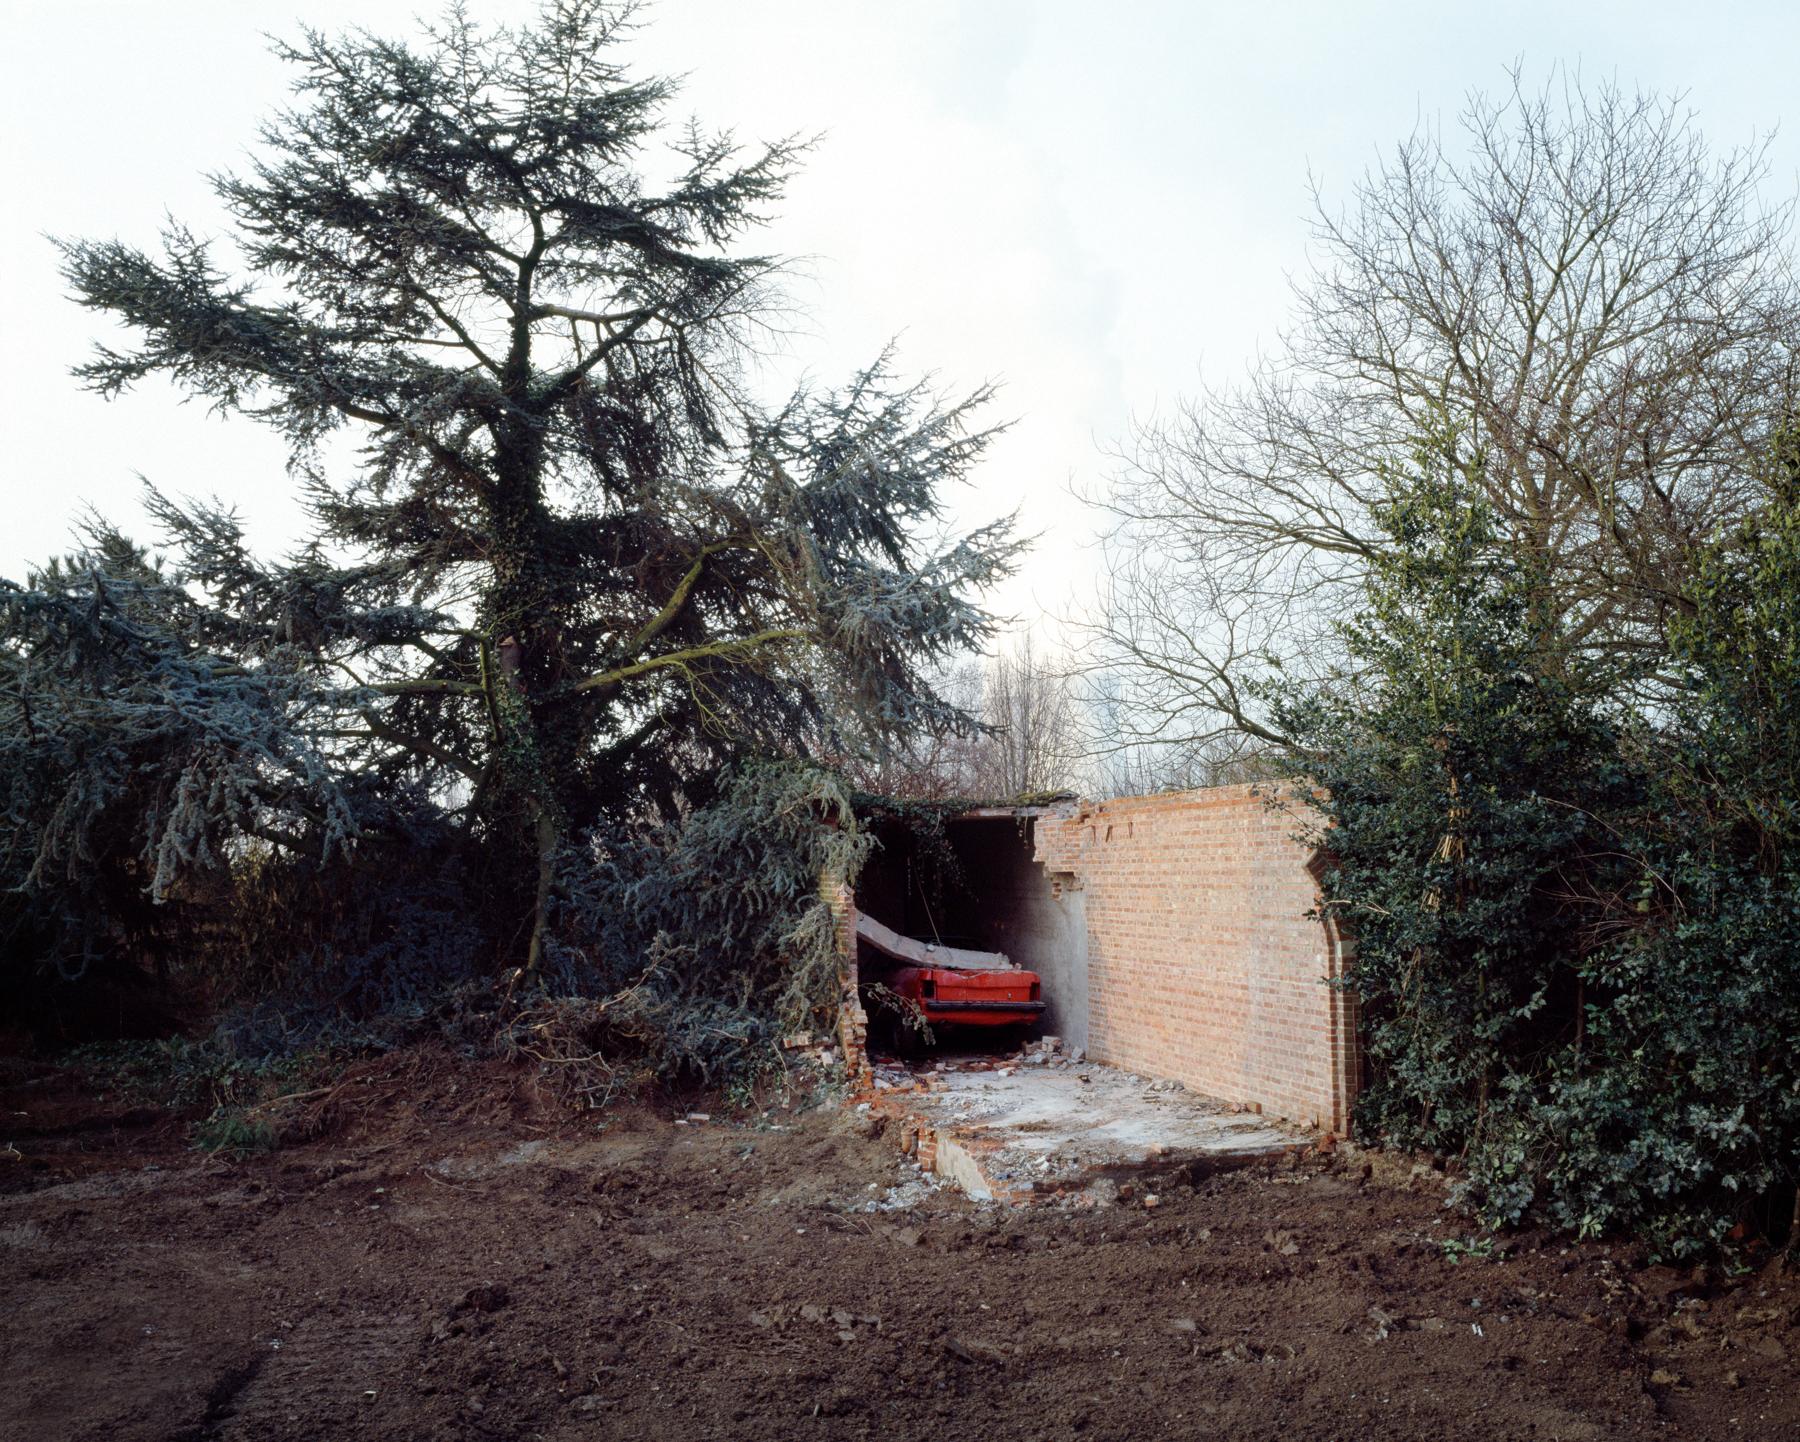 Isabelle_Pateer_05 deconstruction of the village of Doel.jpg